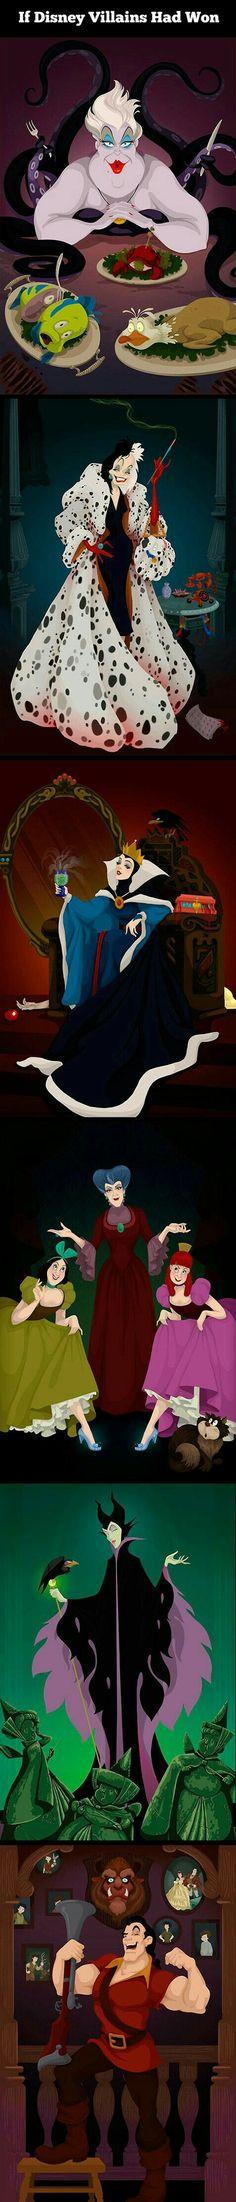 Funny pictures about If Disney villains had won. Oh, and cool pics about If Disney villains had won. Also, If Disney villains had won. Disney Pixar, Walt Disney, Disney Magic, Disney E Dreamworks, Disney Villains, Disney Characters, Humanized Disney, Evil Disney, Humour Disney